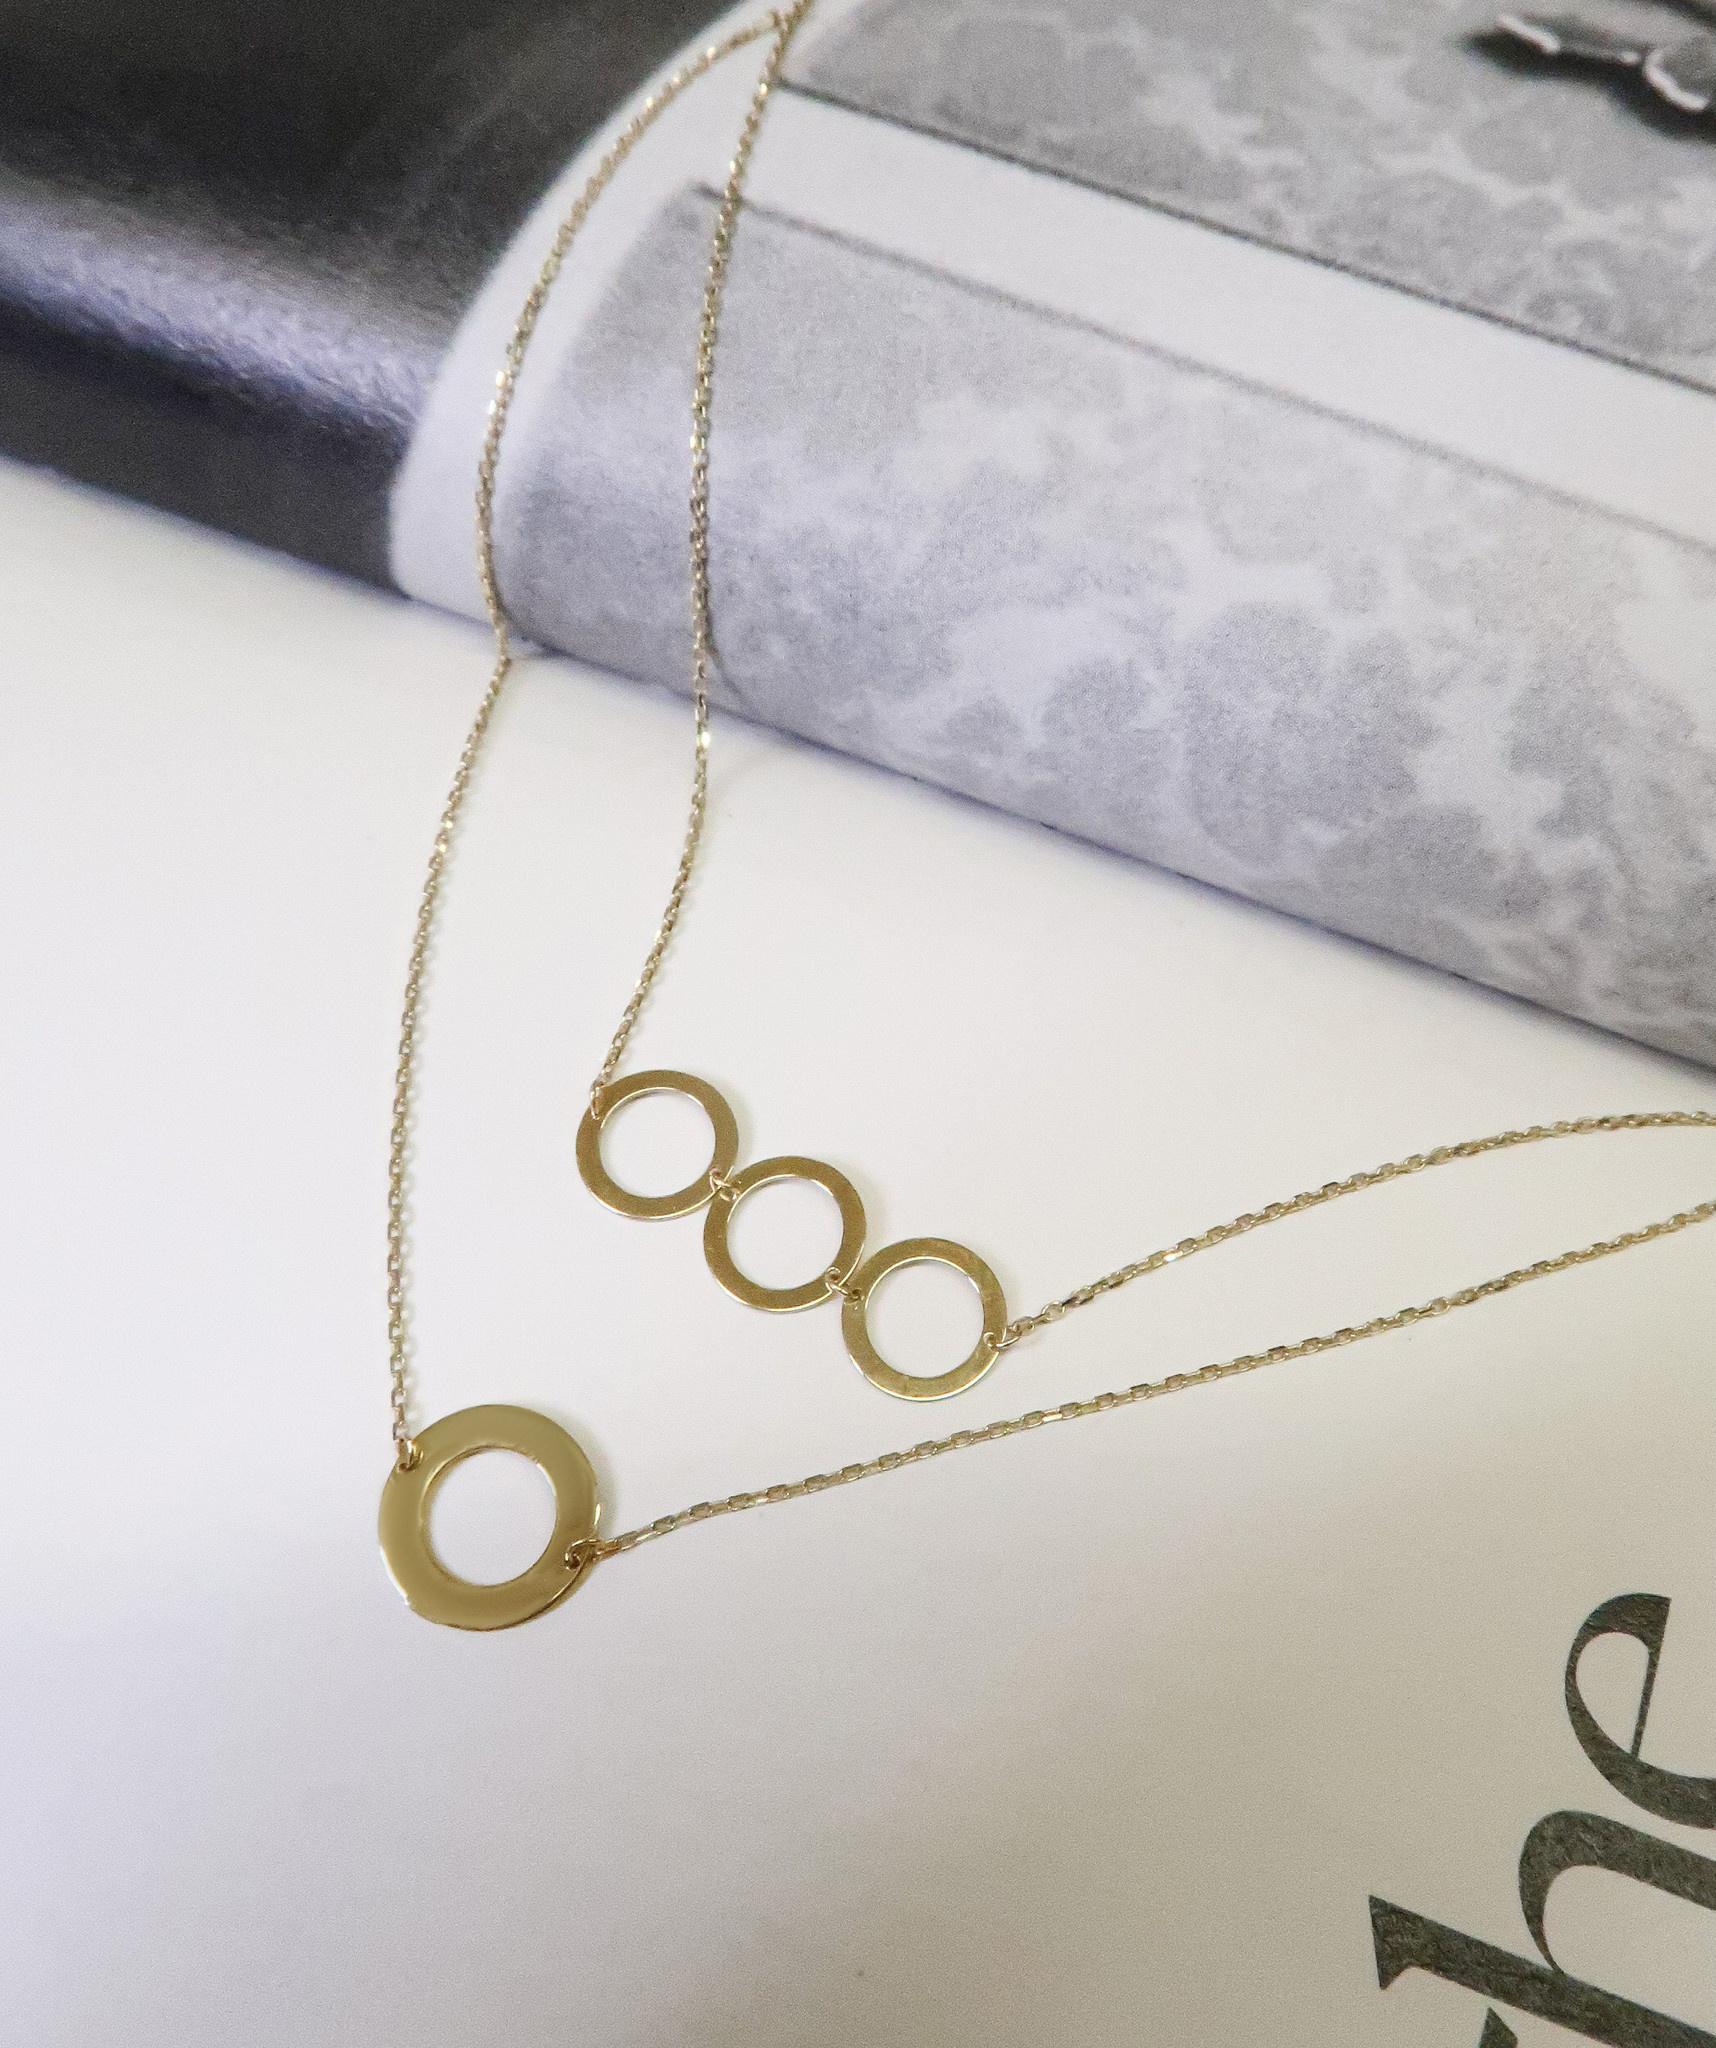 14 karaat geelgouden dames ketting - Jackie - De Circles Necklace-3